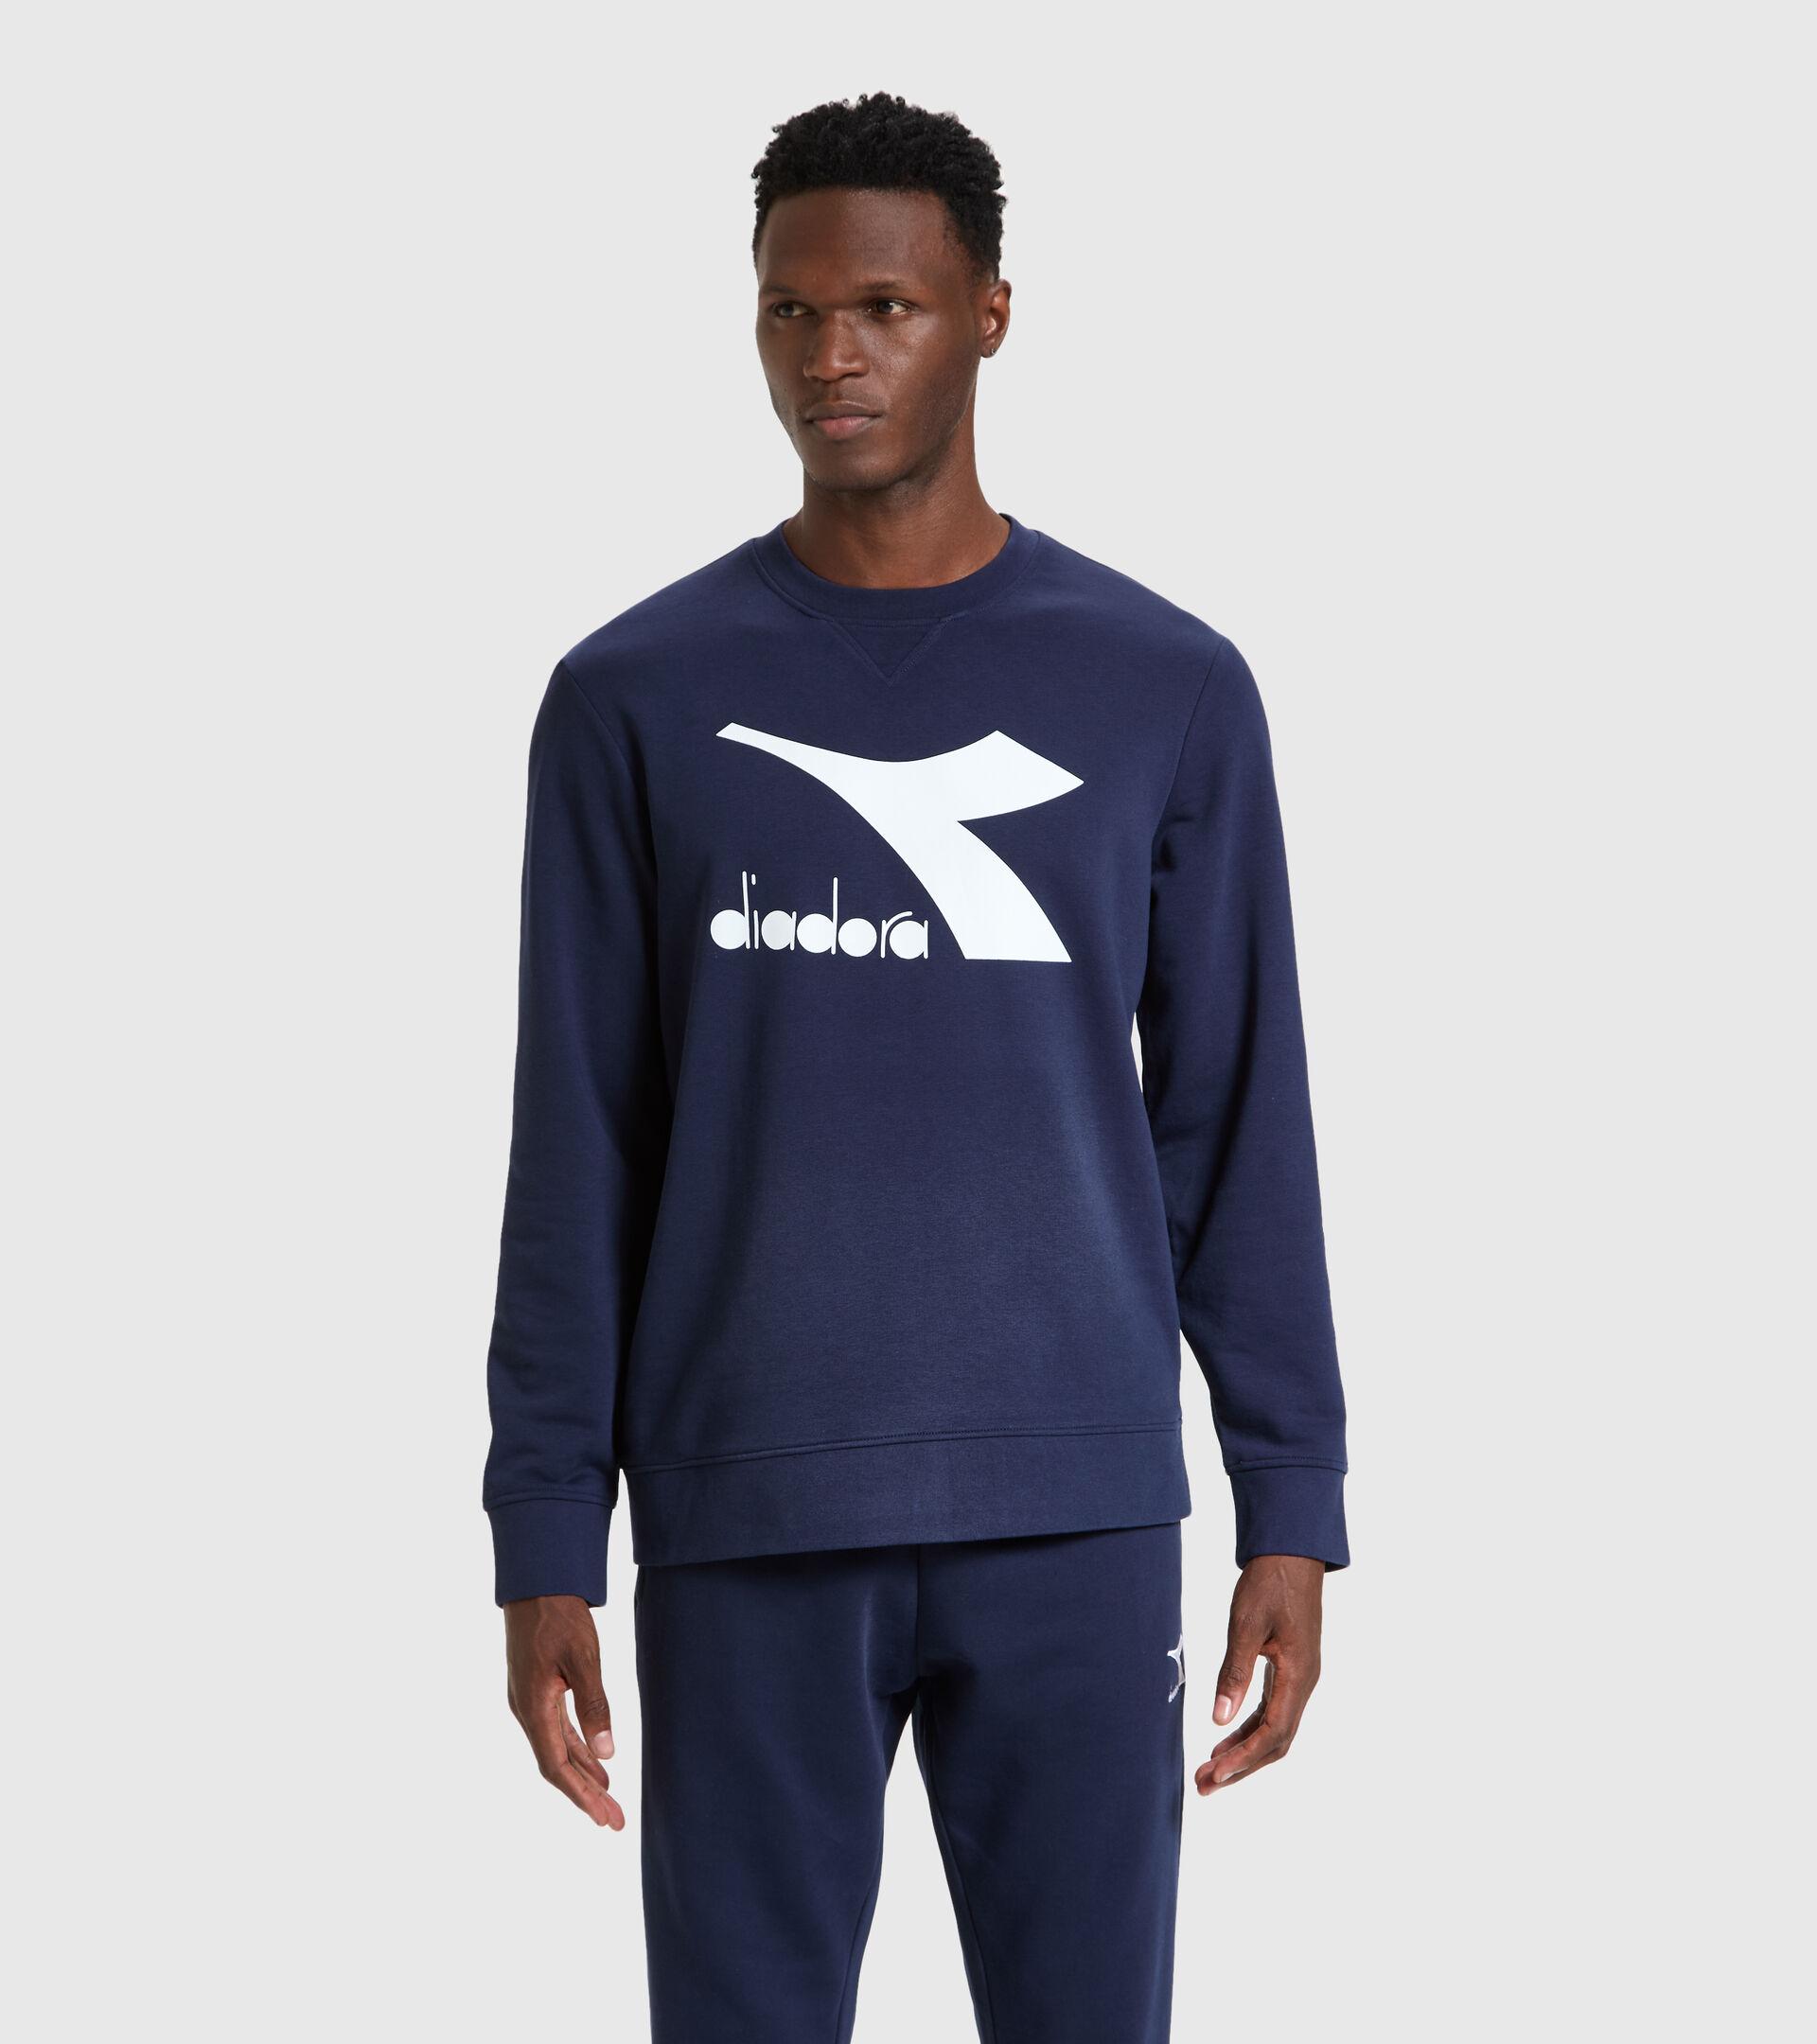 Crew-neck sweatshirt - Men SWEATSHIRT CREW LOGO CHROMIA CLASSIC NAVY - Diadora